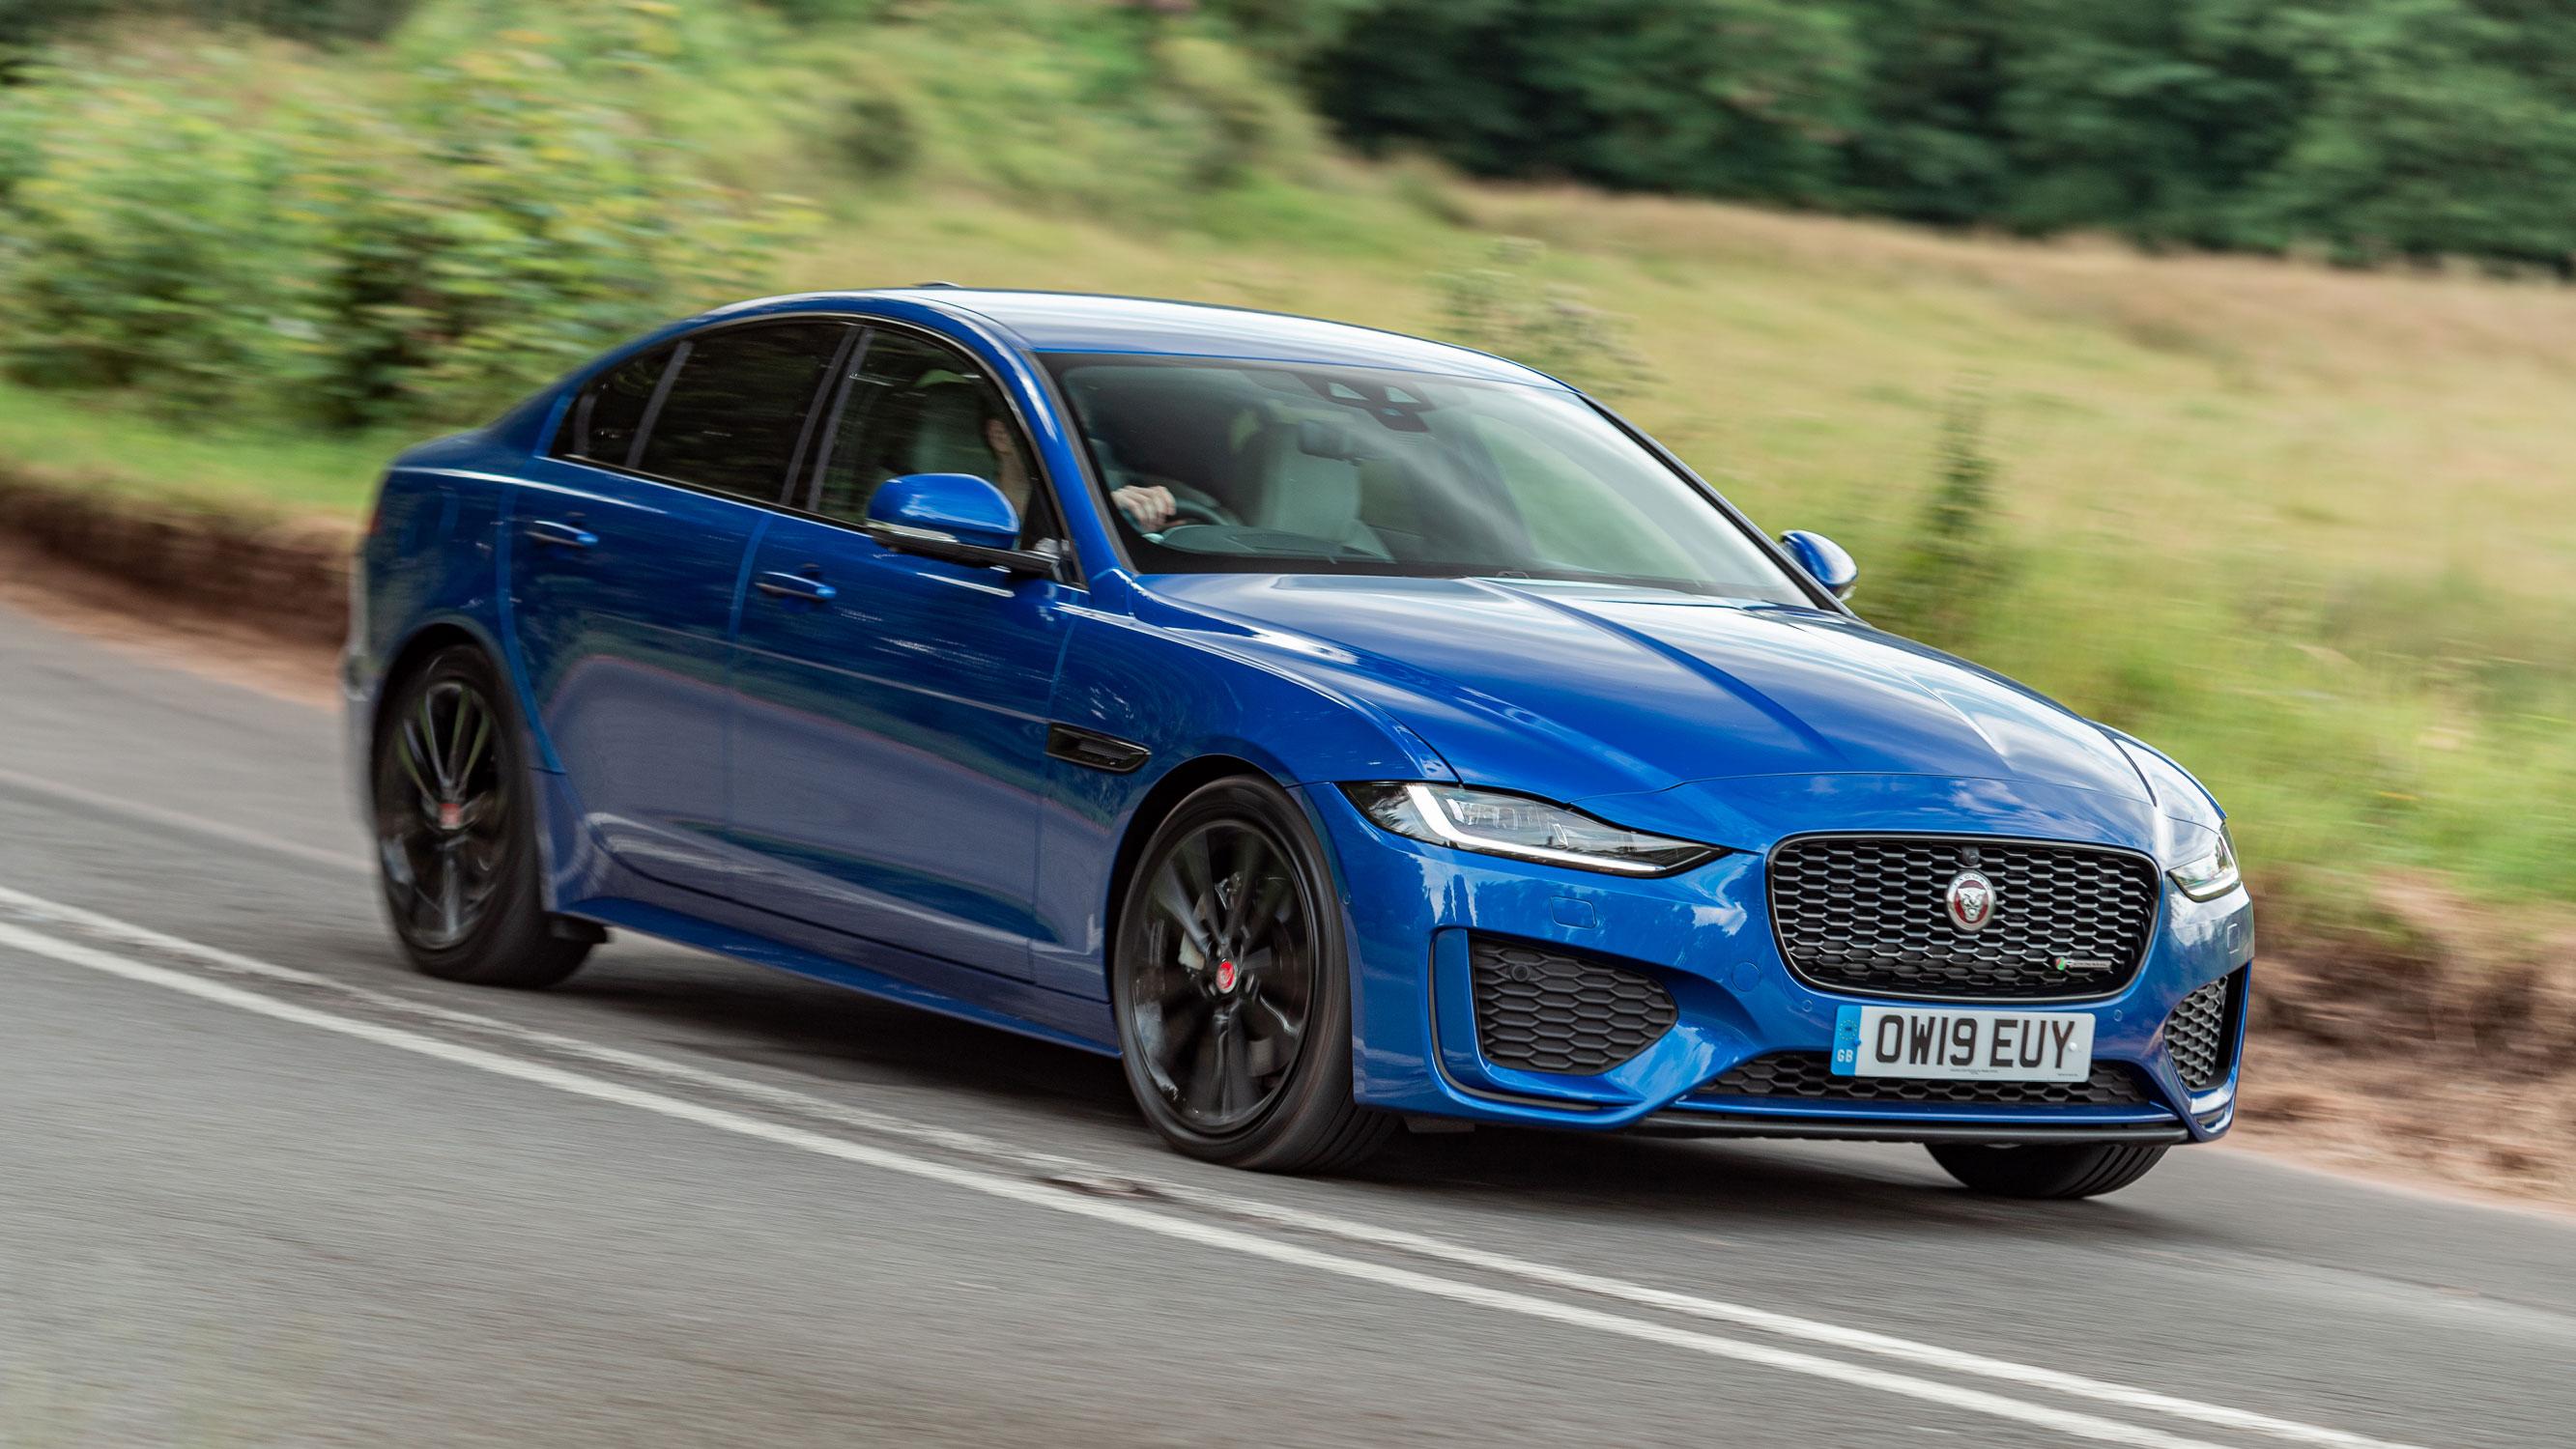 New Used Jaguar Xe Cars For Sale Autotrader